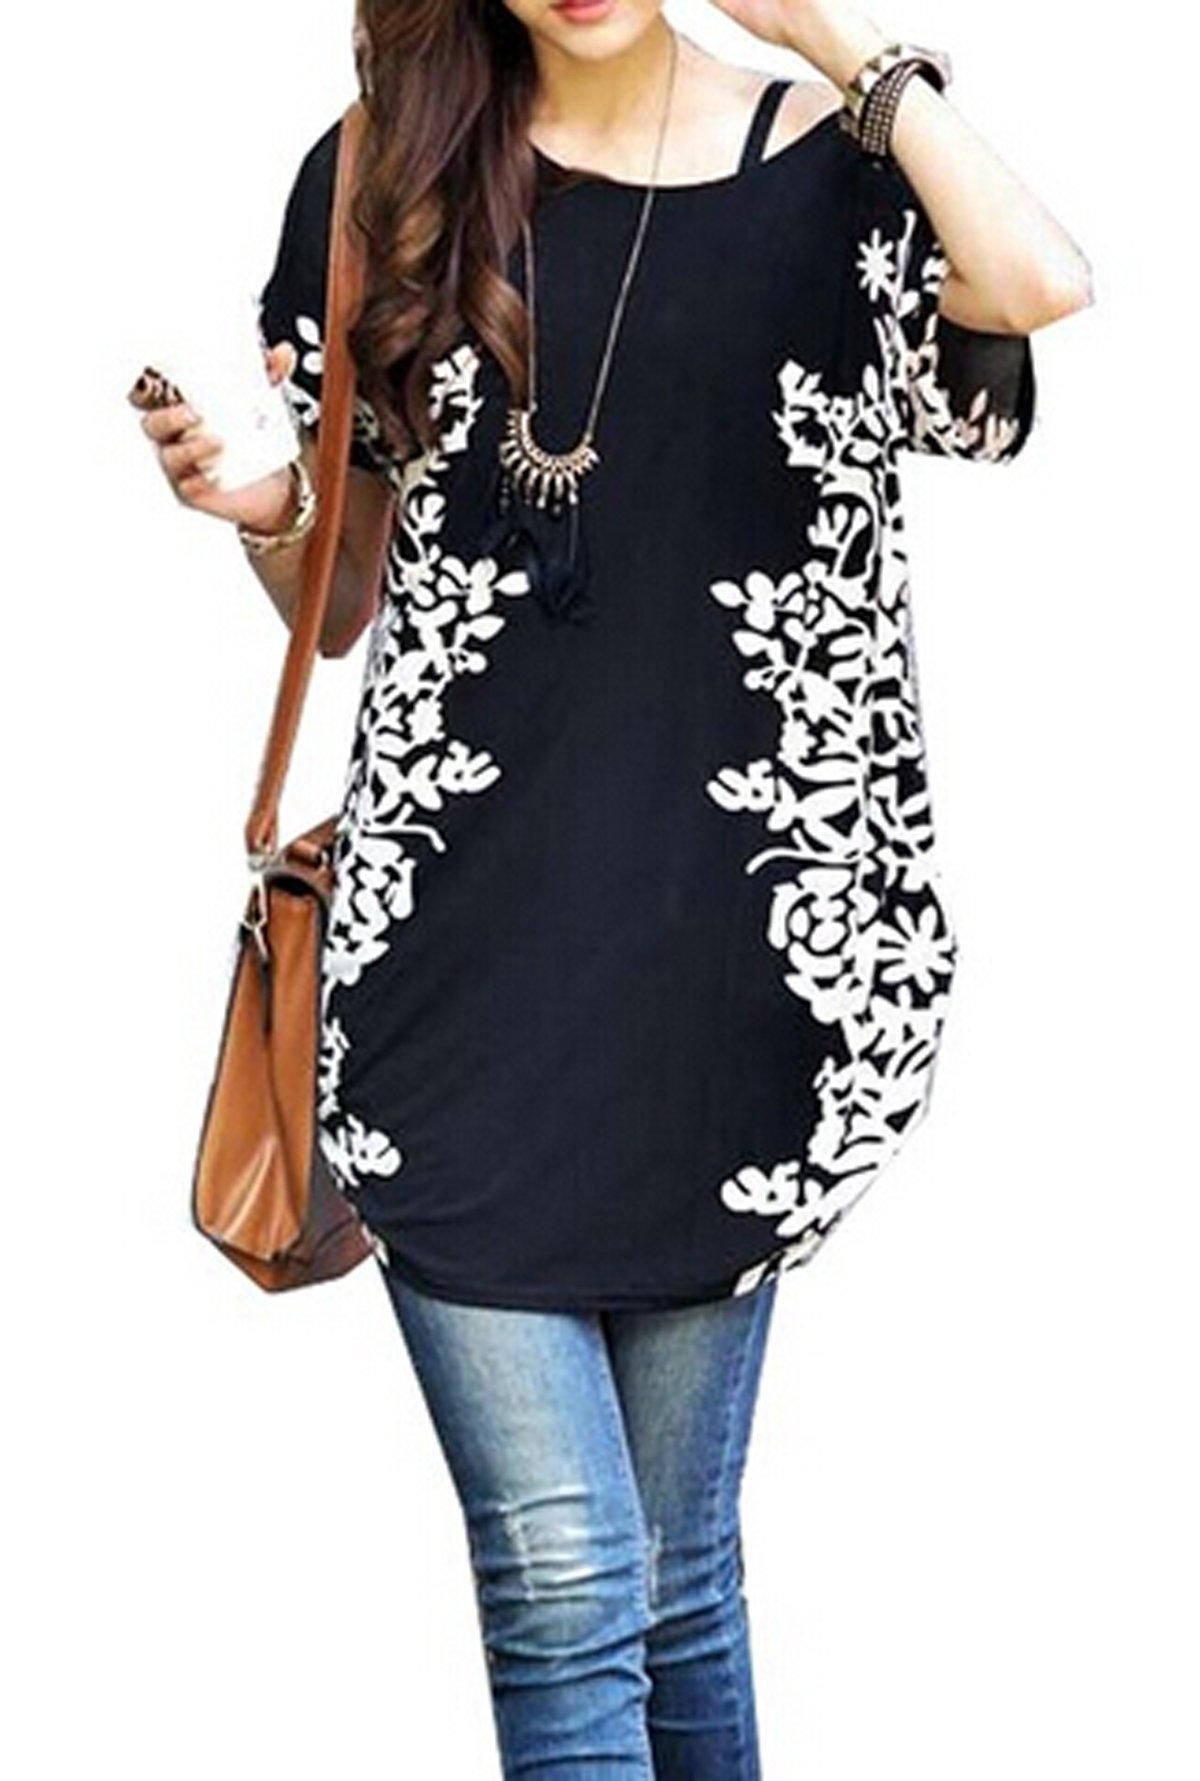 Relipop Women Summer Tunic Short Sleeve Casual Loose Blouse Top (Medium, Black)